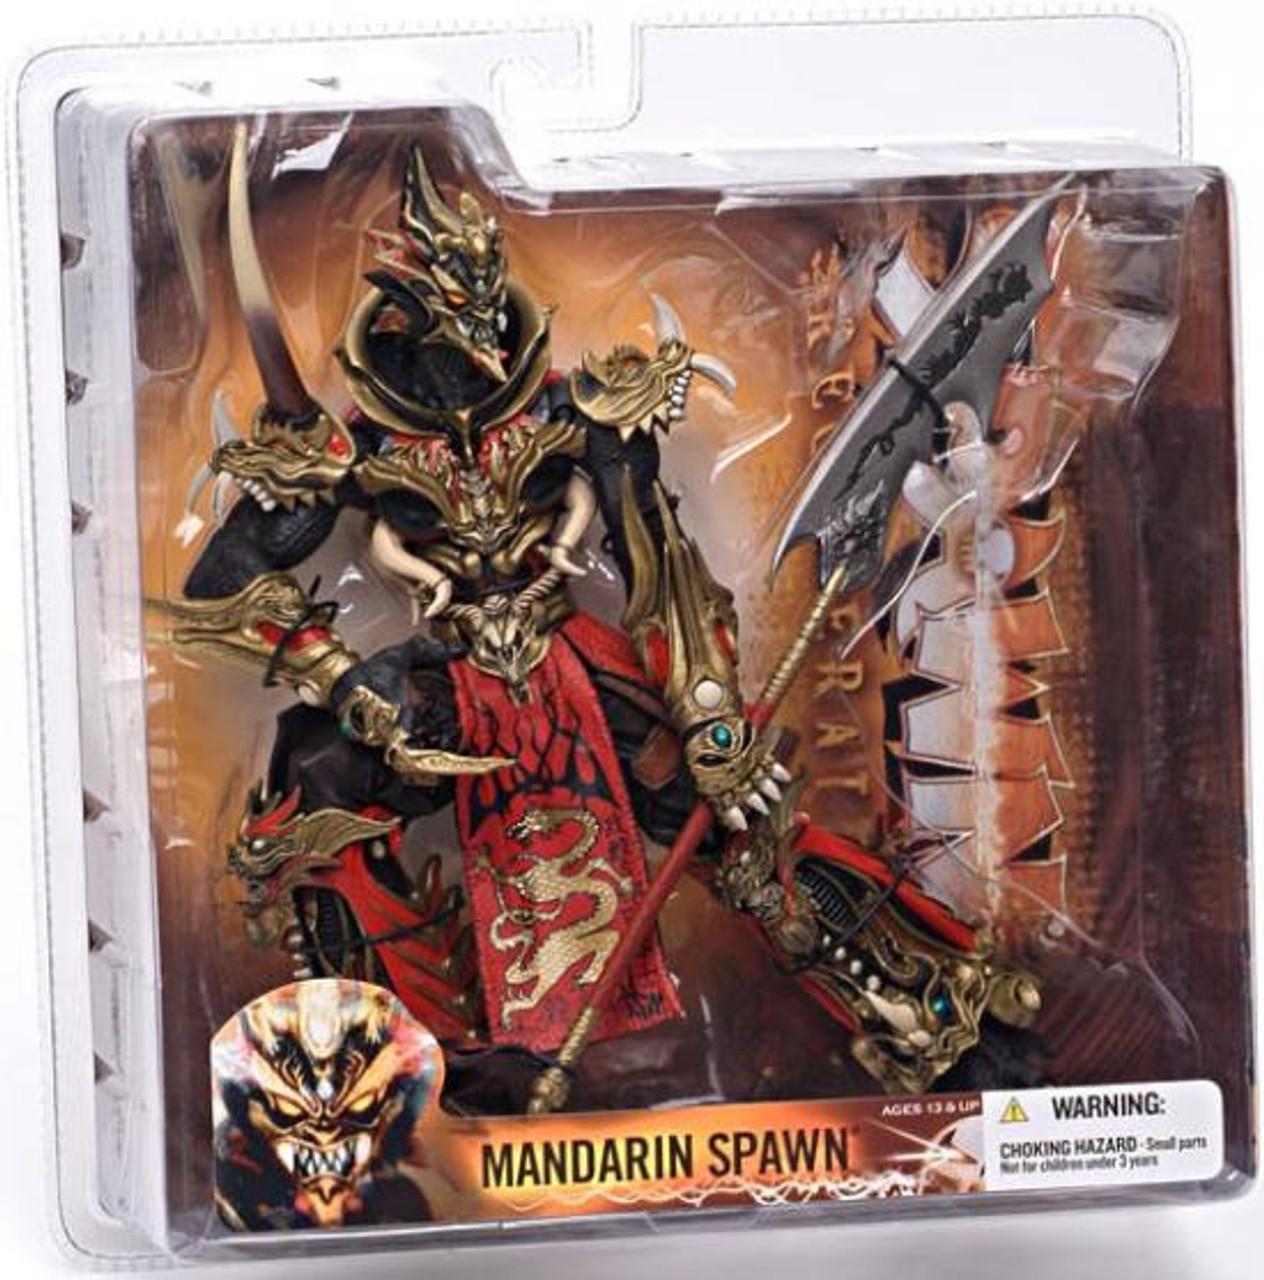 McFarlane Toys Series 28 Regenerated Mandarin Spawn Action Figure